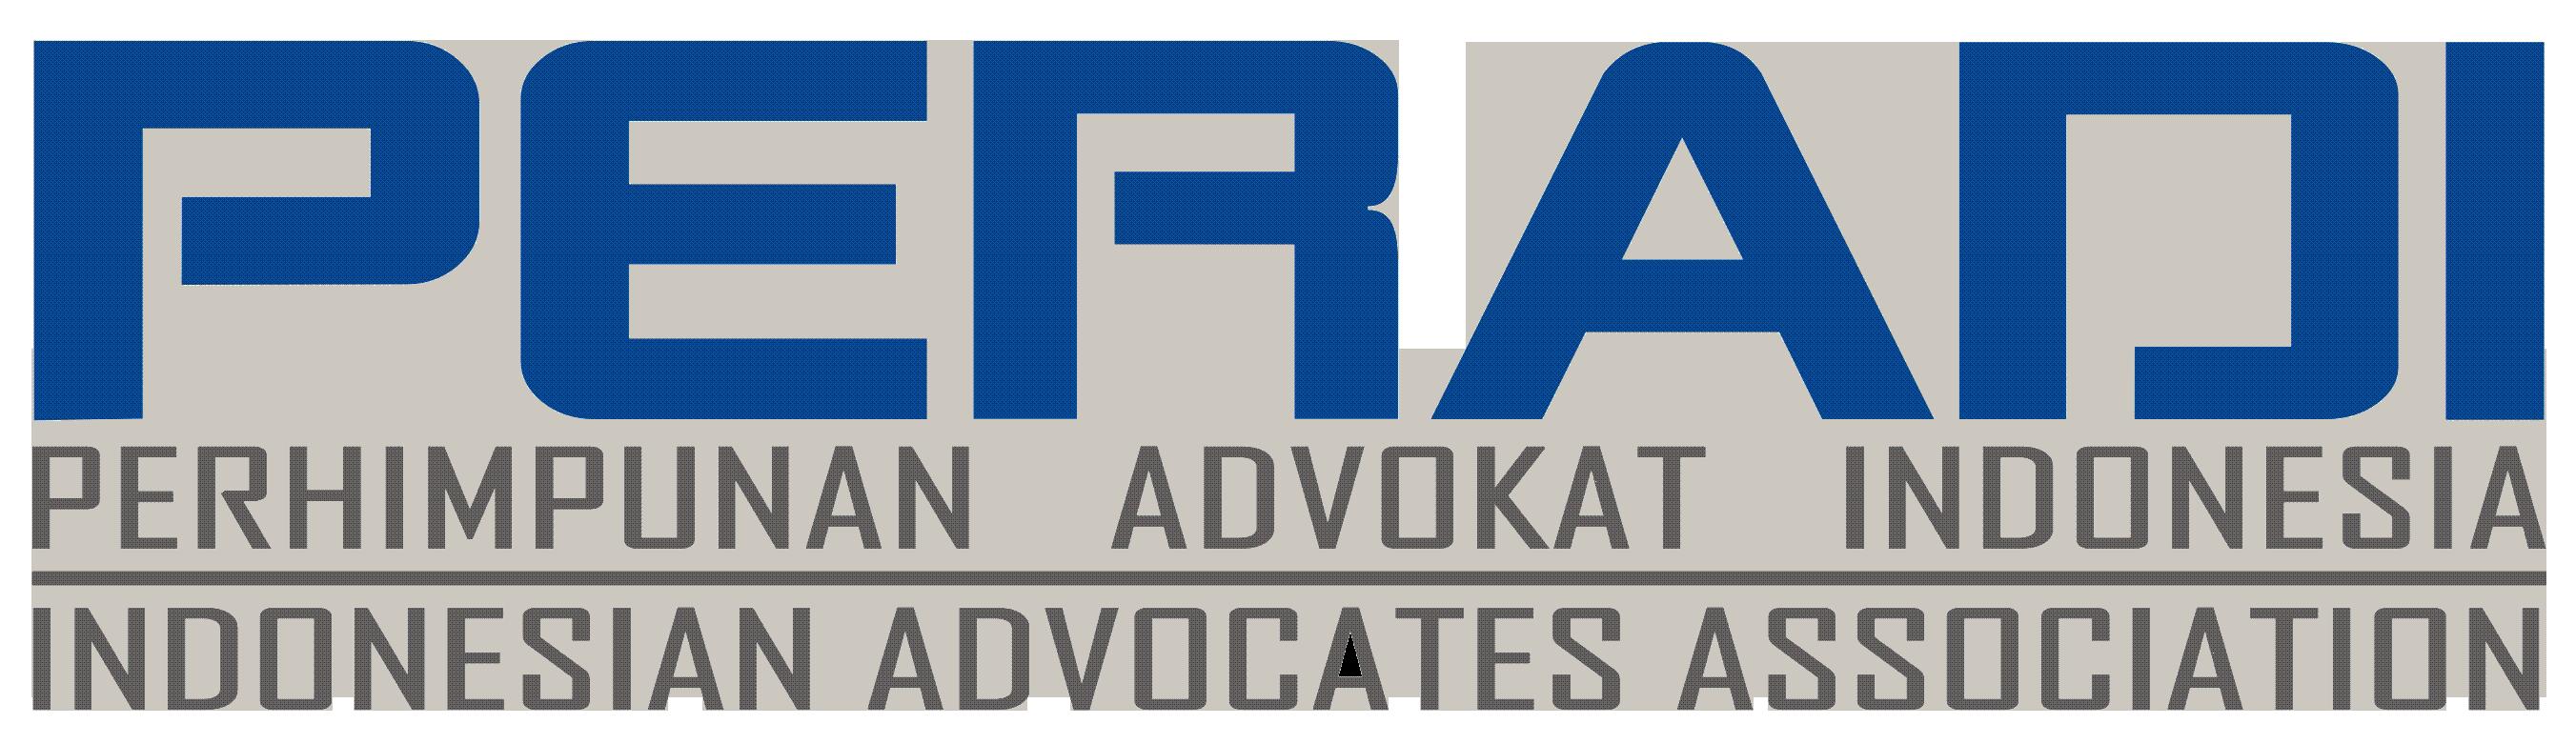 Website Resmi Perhimpunan Advokat Indonesia